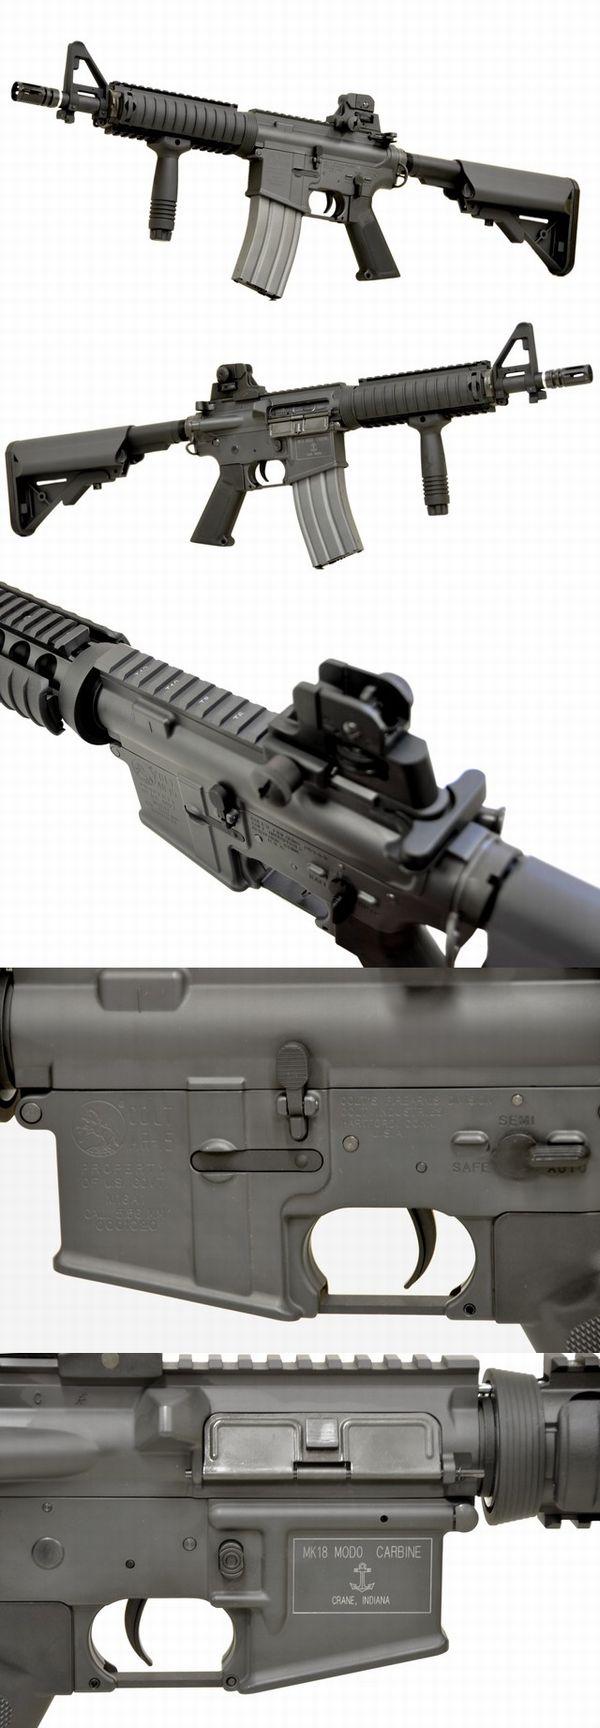 VFC Colt Mk18Mod0 AEG